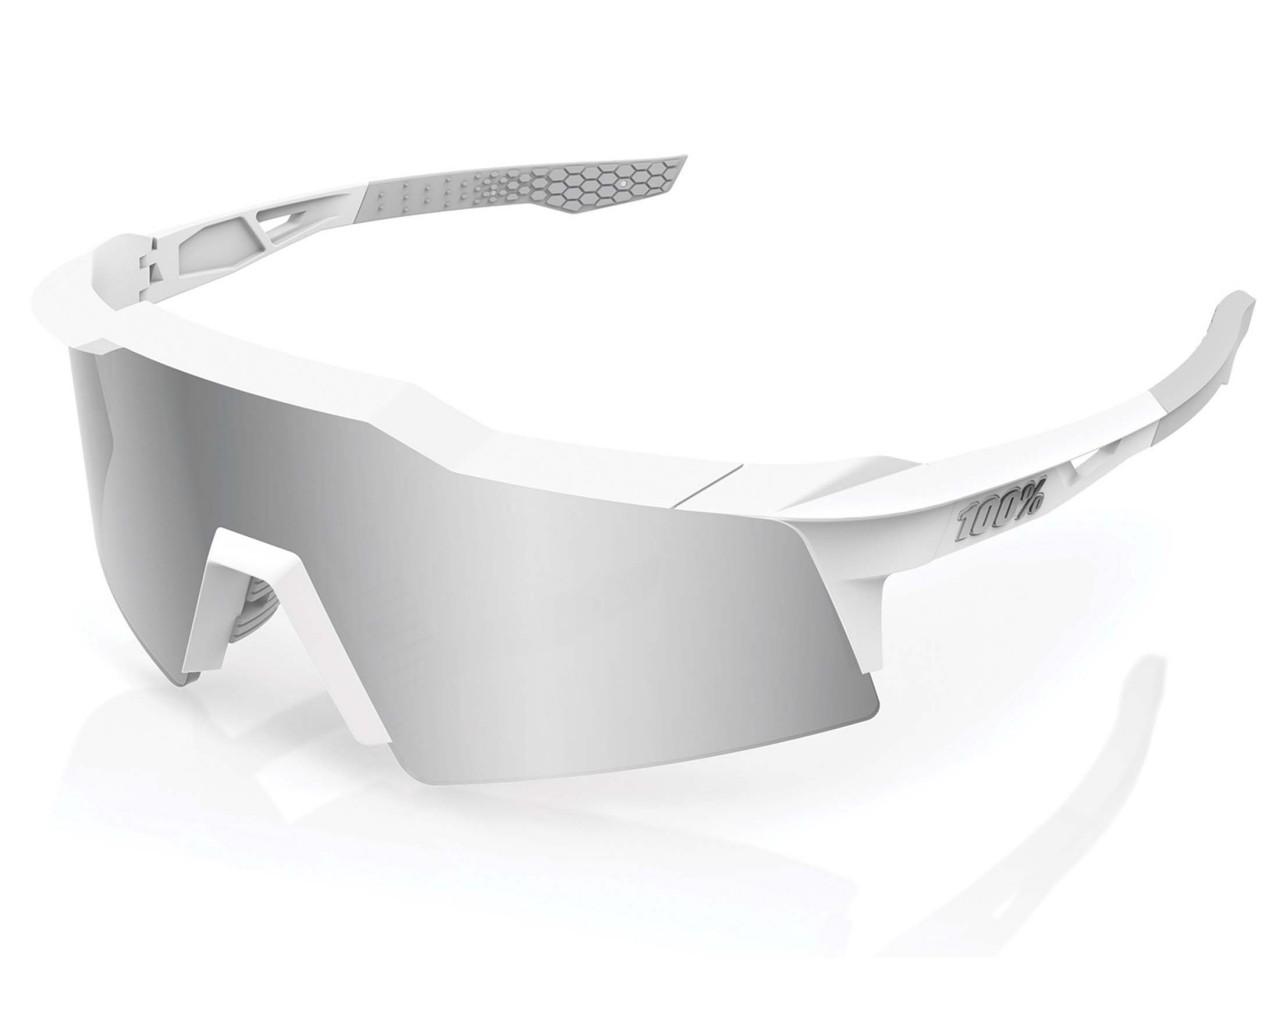 100% Speedcraft XS HiPER Multilayer Sports Sunglasses | matt white Hiper